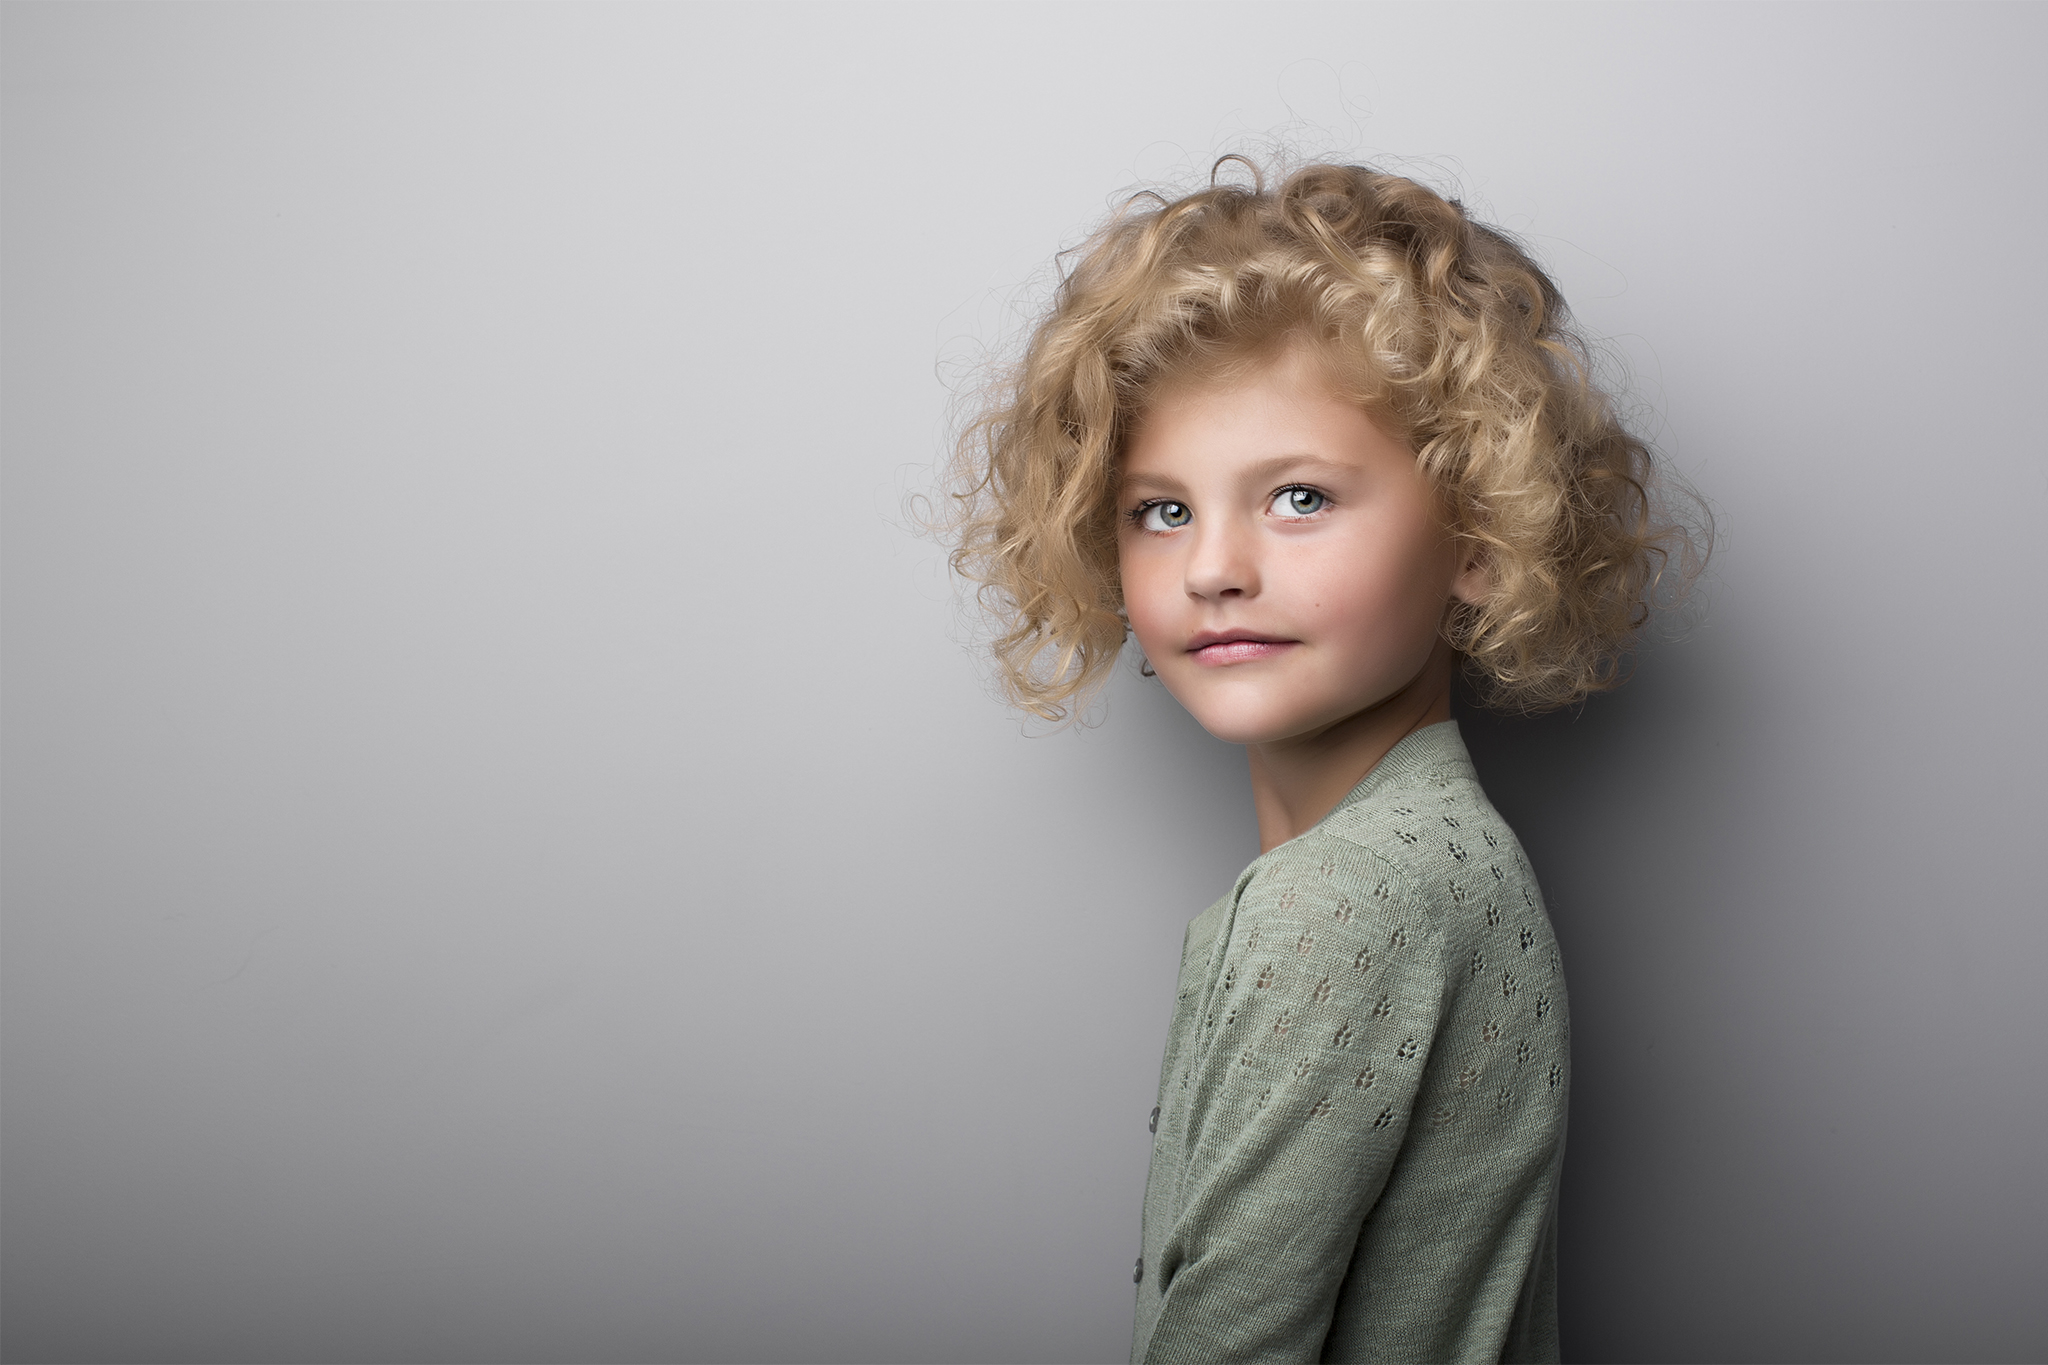 elizabethgphotography_fineart_kingslangley_hertfordshire_model_alexa_tiny_angels.jpg